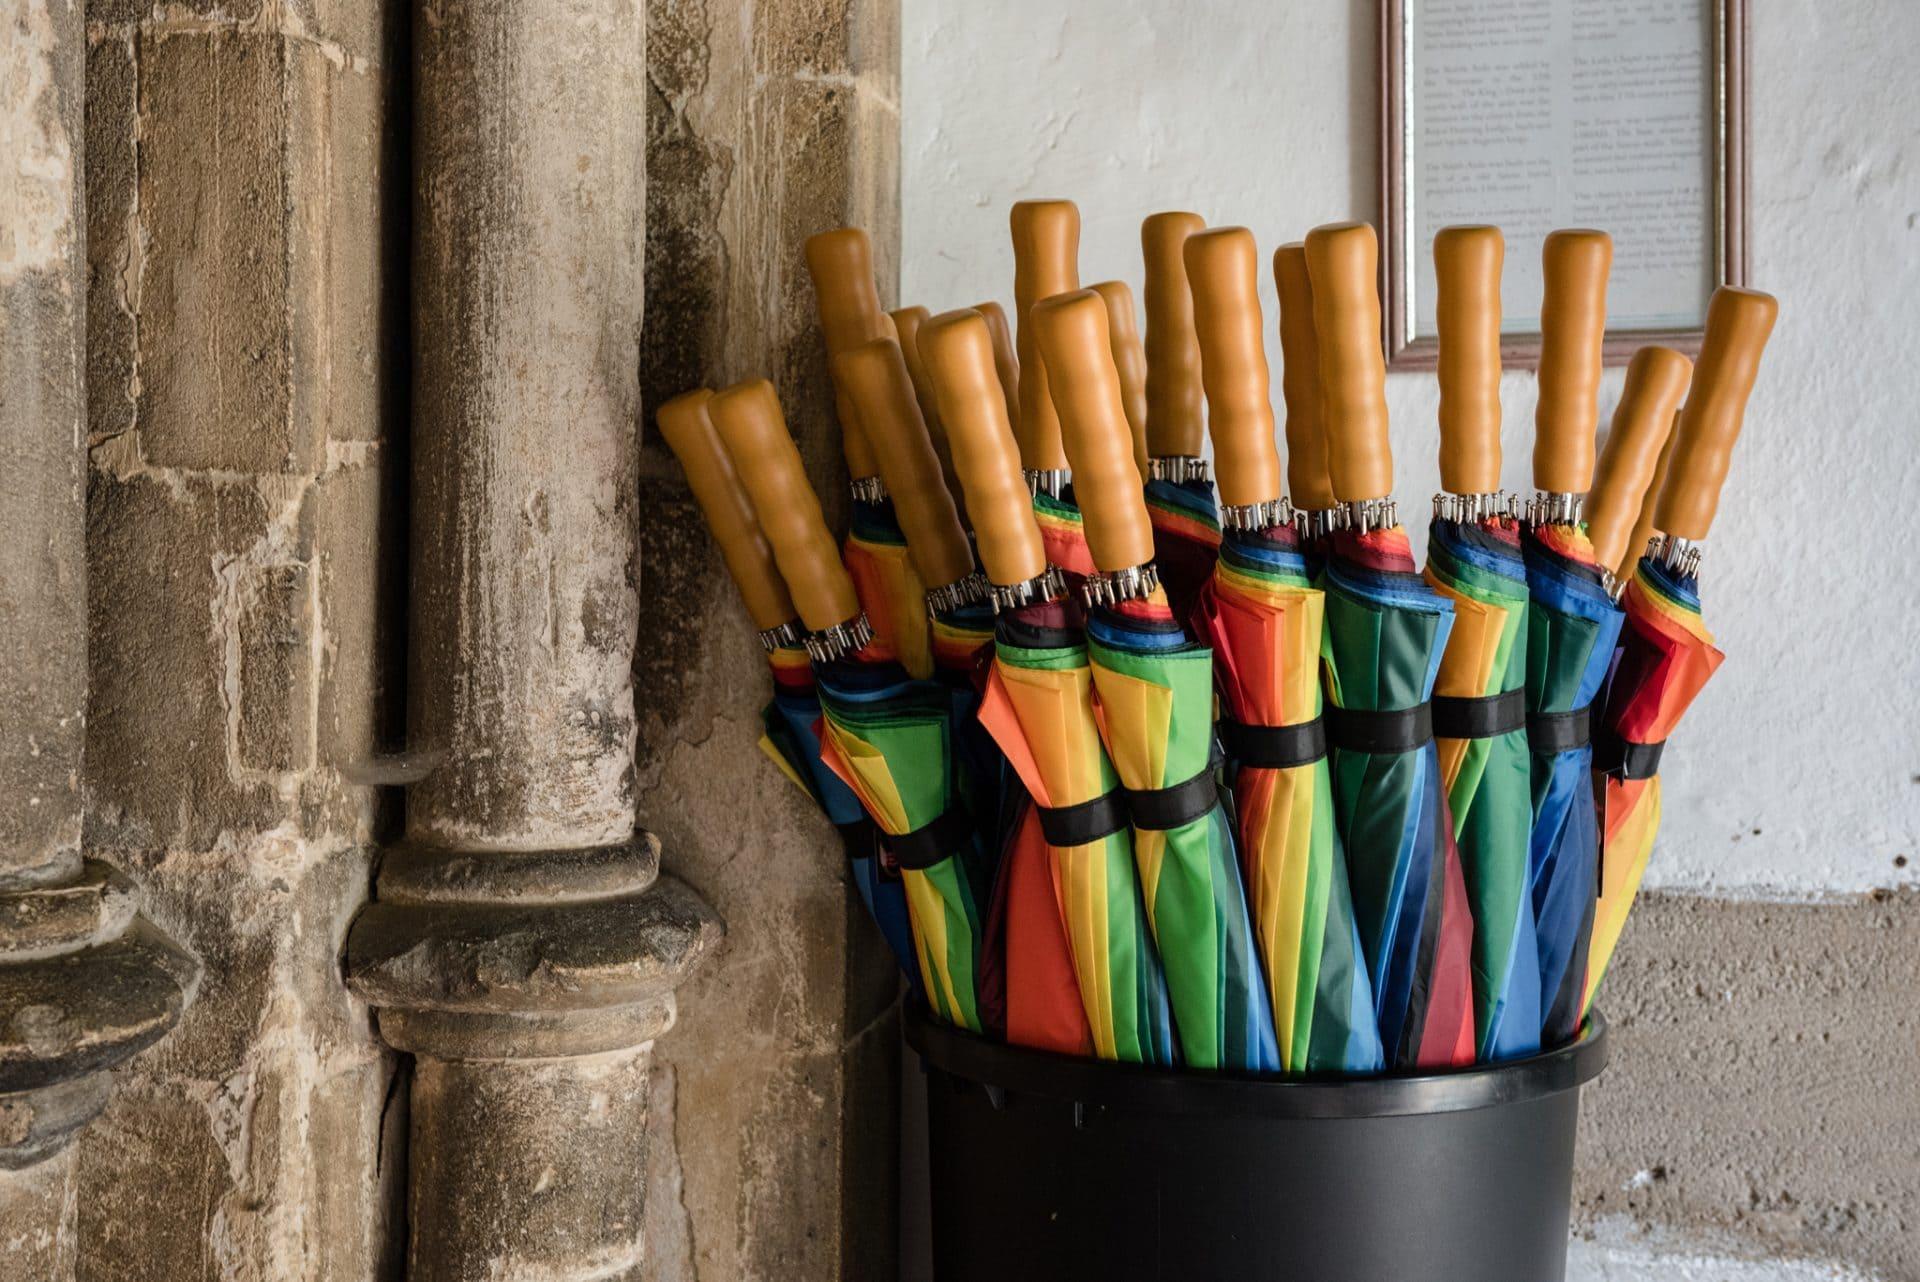 Rainbow umbrellas at a wedding